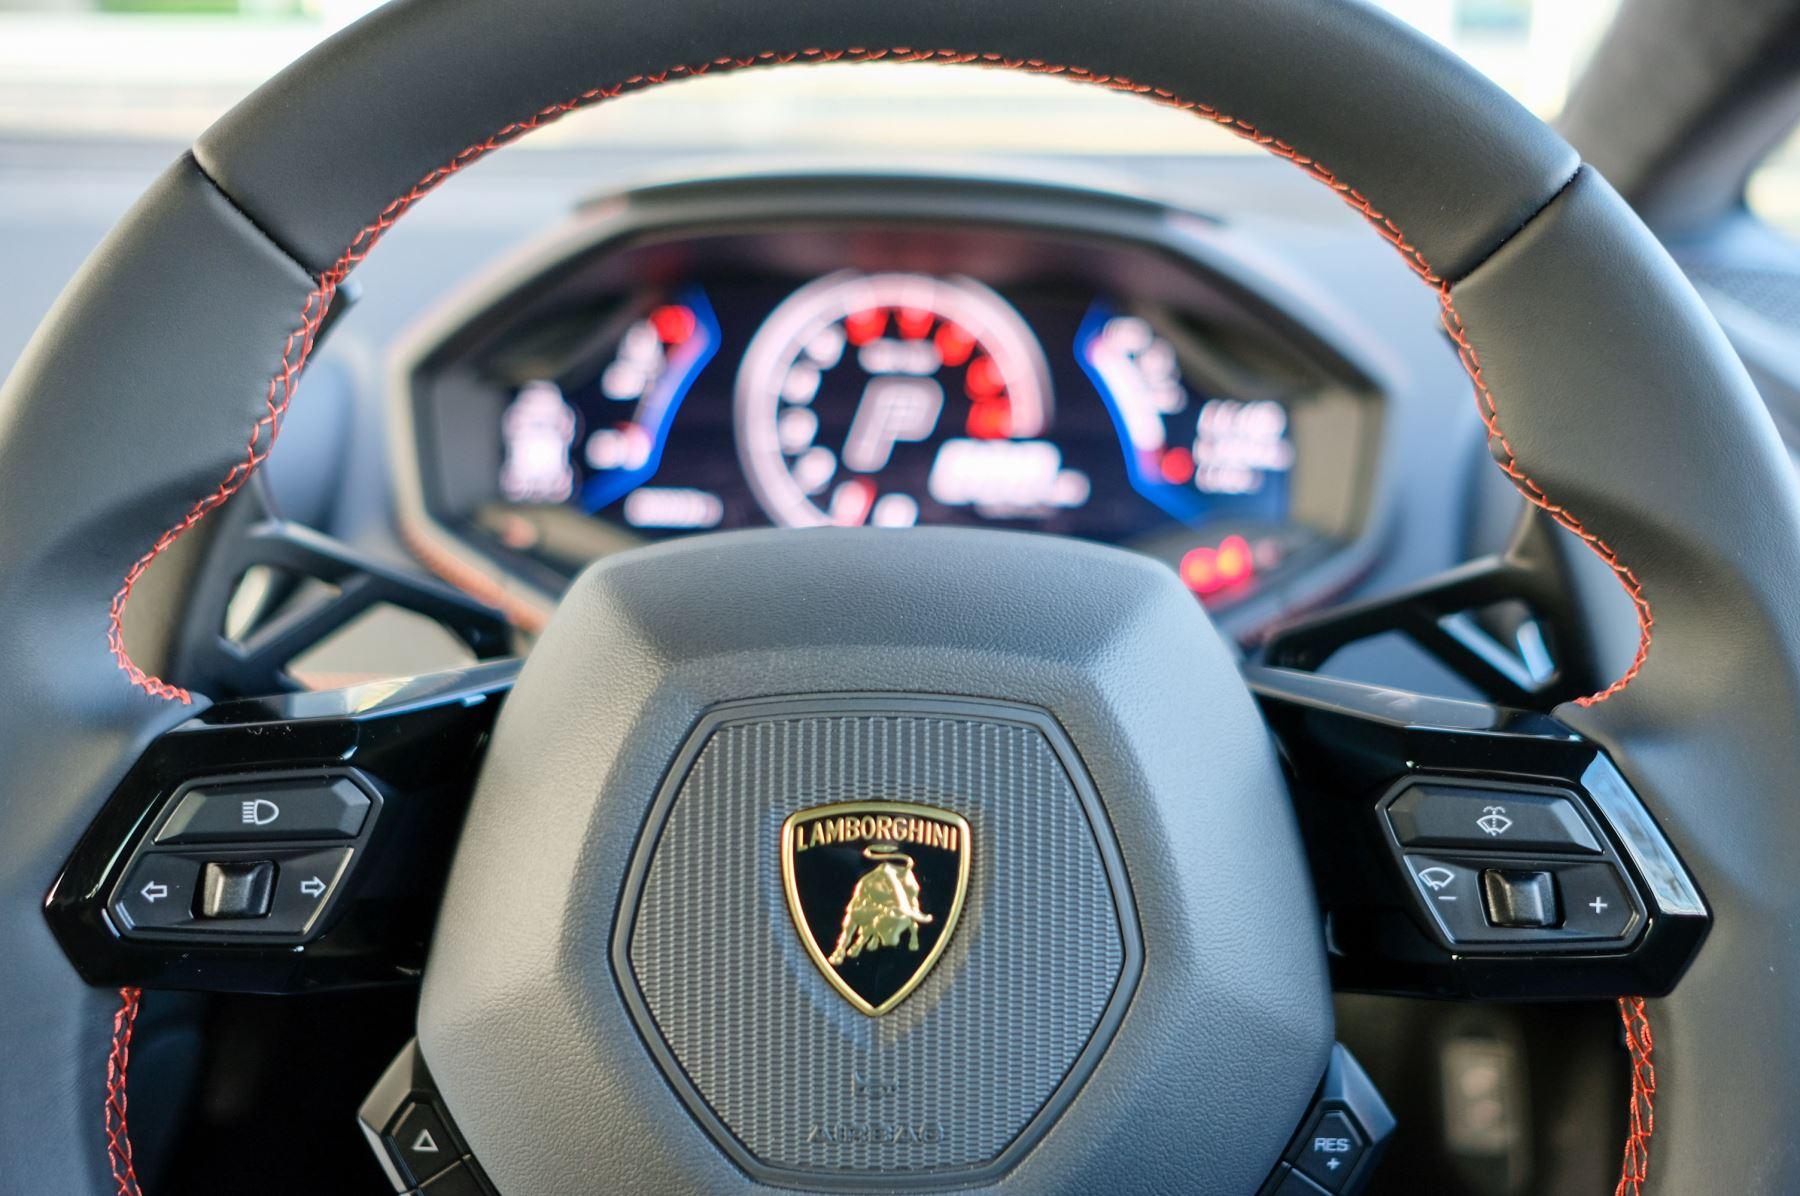 Lamborghini Huracan EVO 5.2 V10 640 2dr Auto AWD image 18